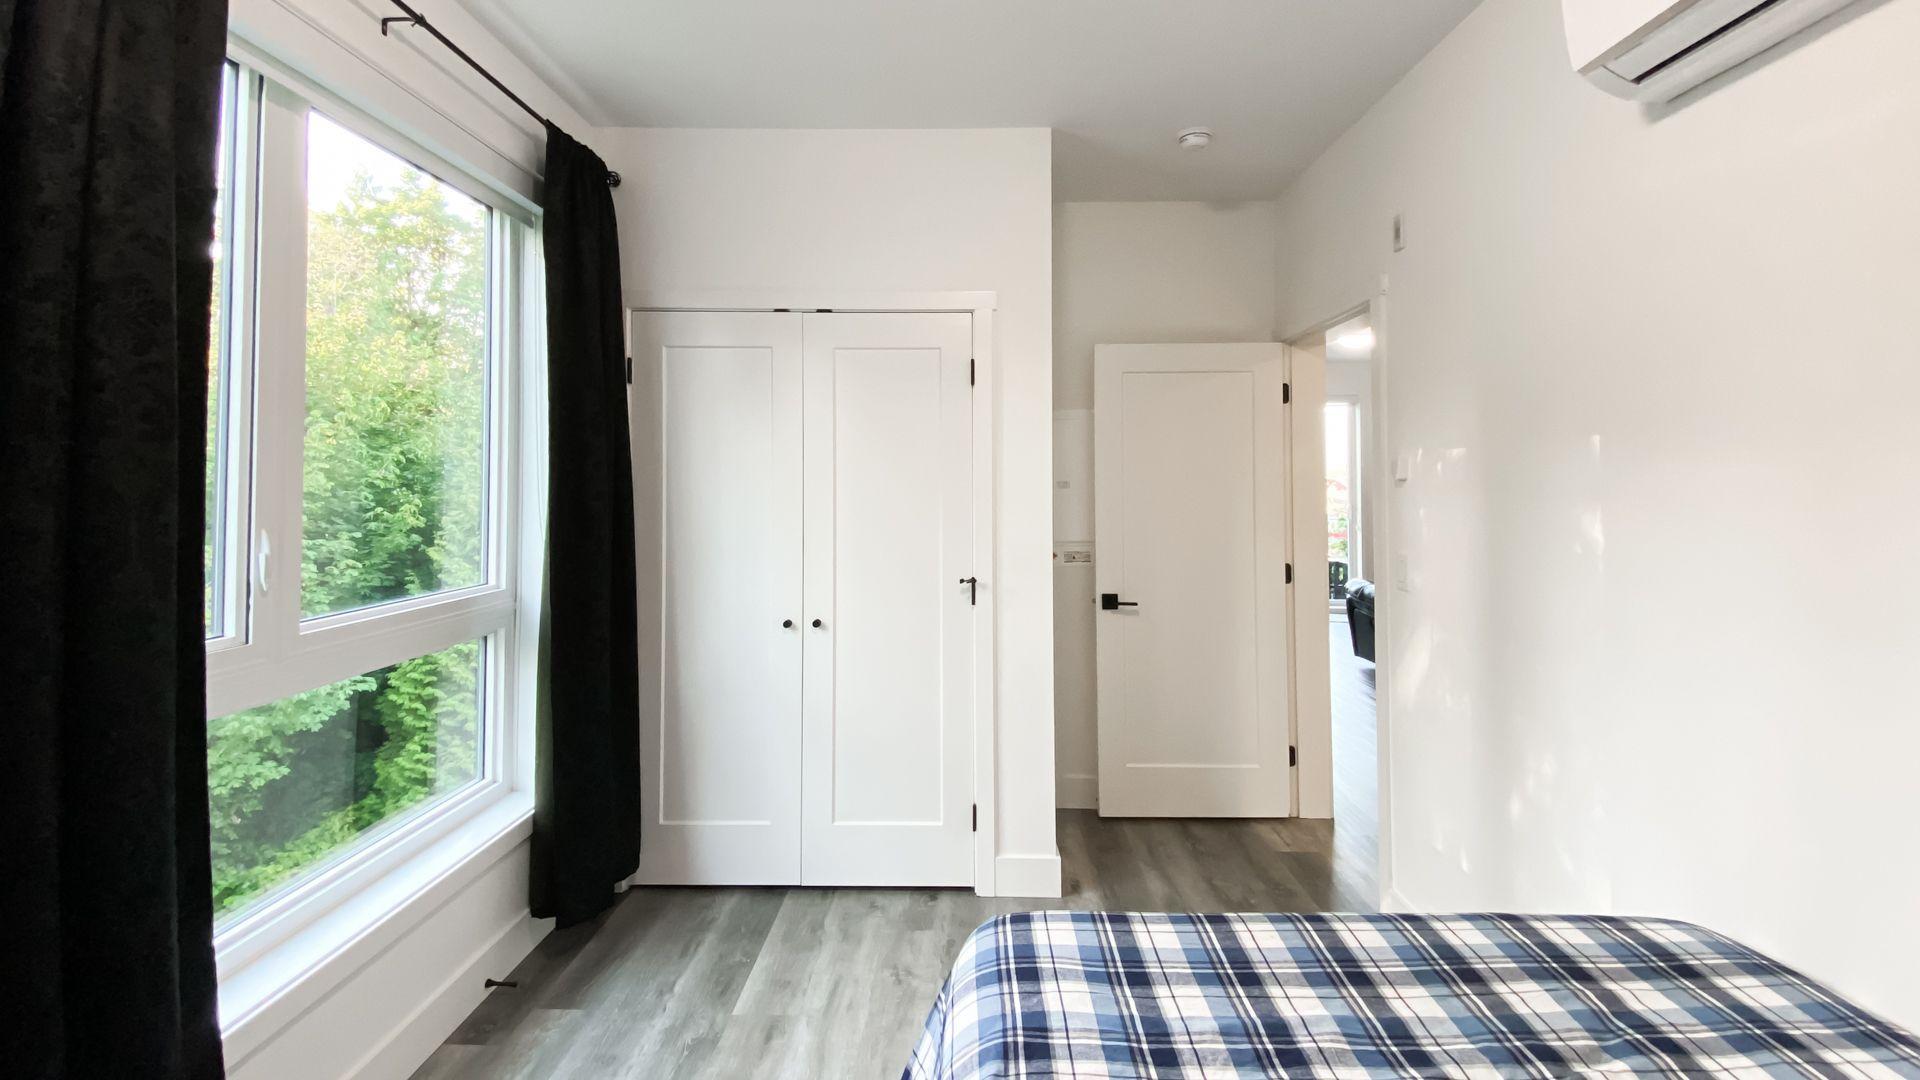 309-12320-222-street-maple-ridge-13 at 309 - 12320 222 Street, West Central, Maple Ridge